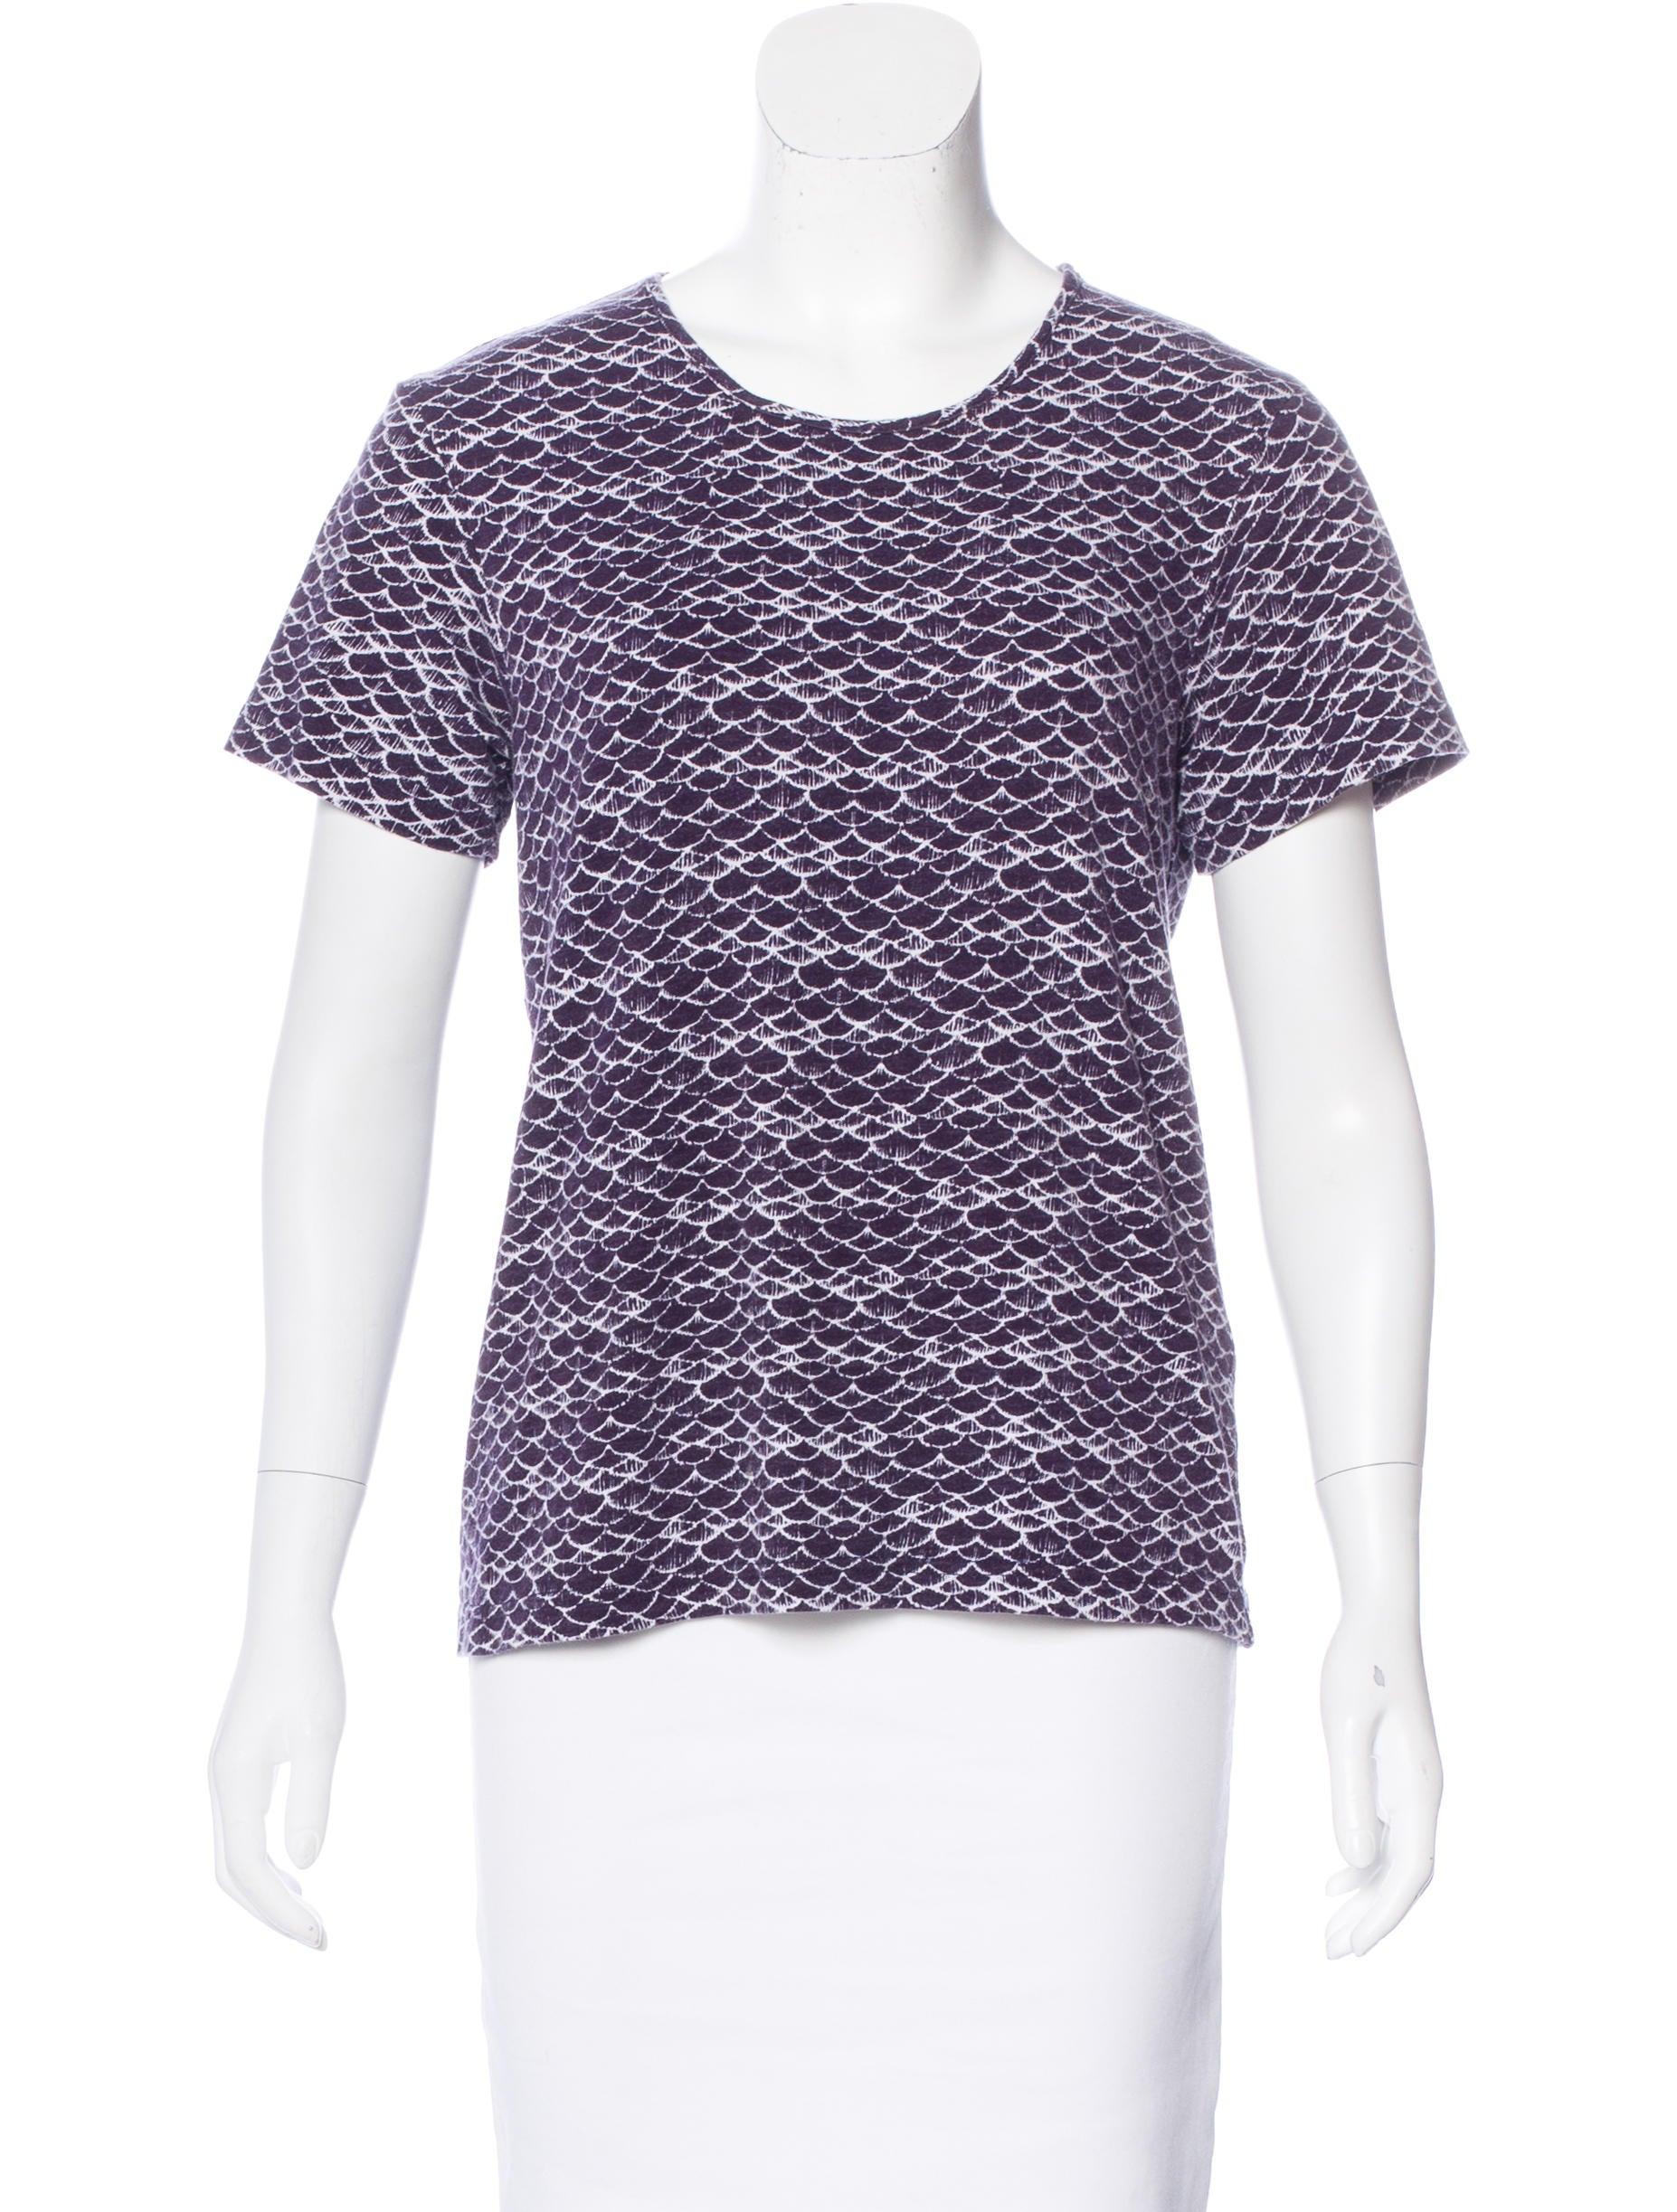 Sea Printed Short Sleeve T Shirt Clothing Wssea23267